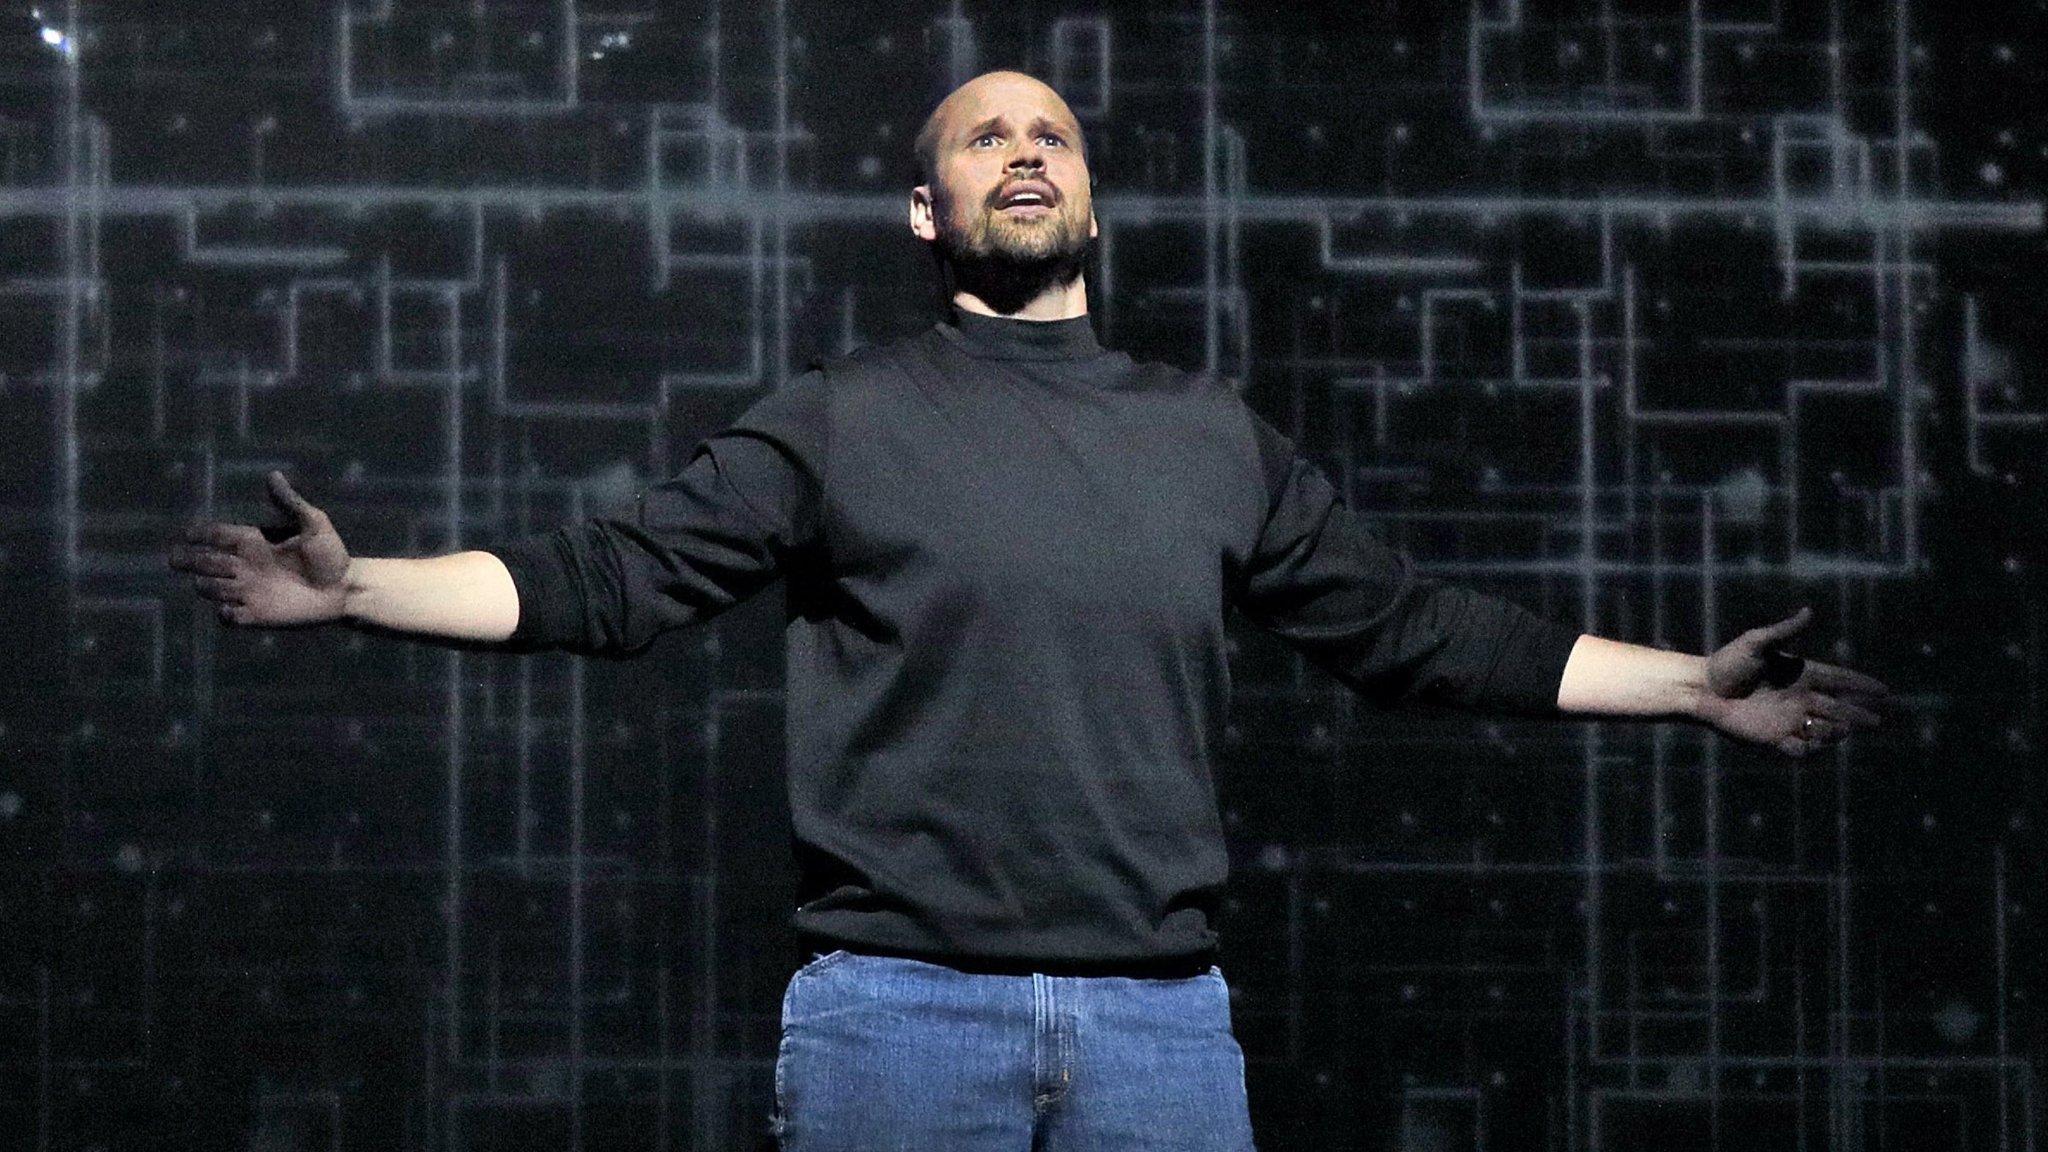 The (R)evolution of Steve Jobs, Santa Fe Opera, New Mexico — high-powered